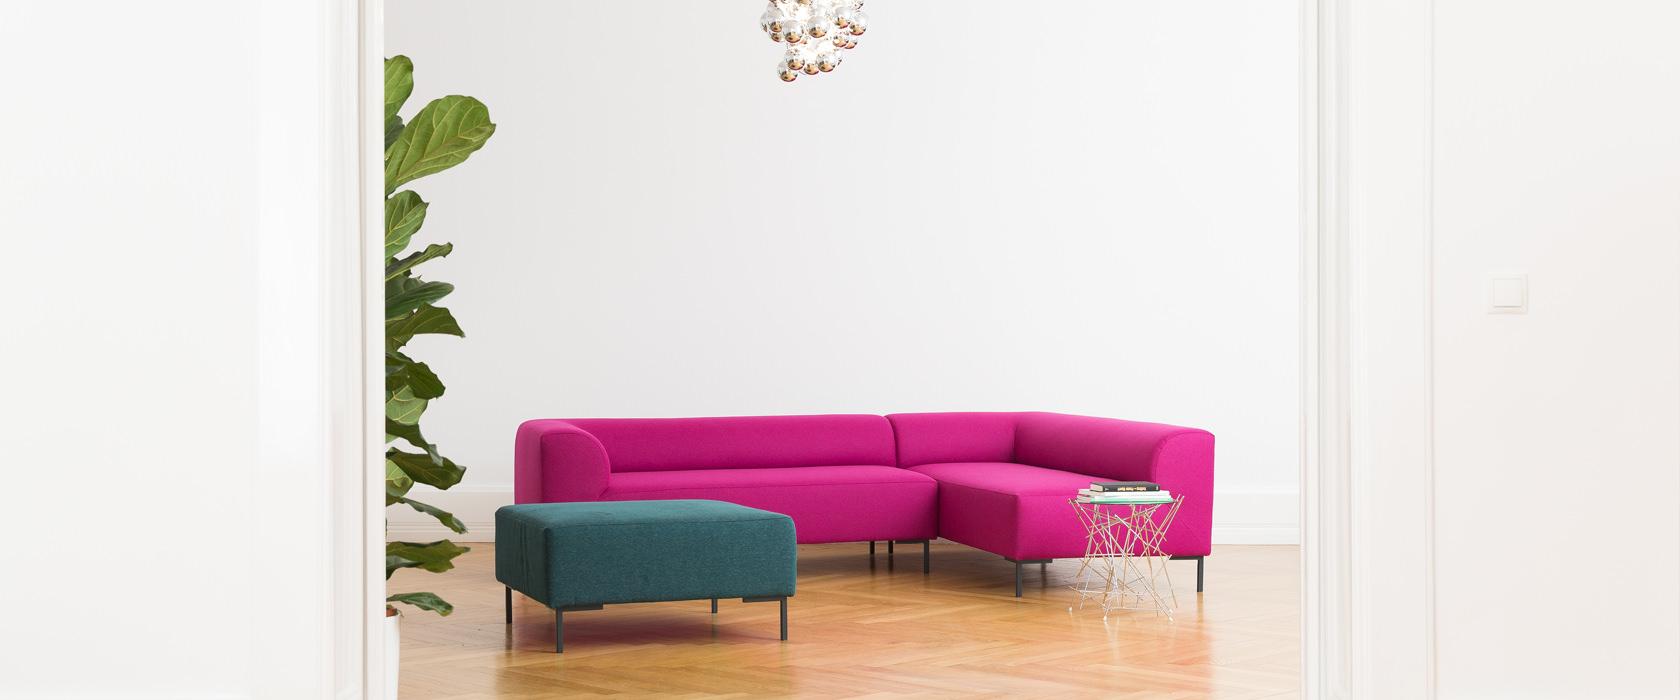 Угловой диван Fernando - Фото 2 - Pufetto